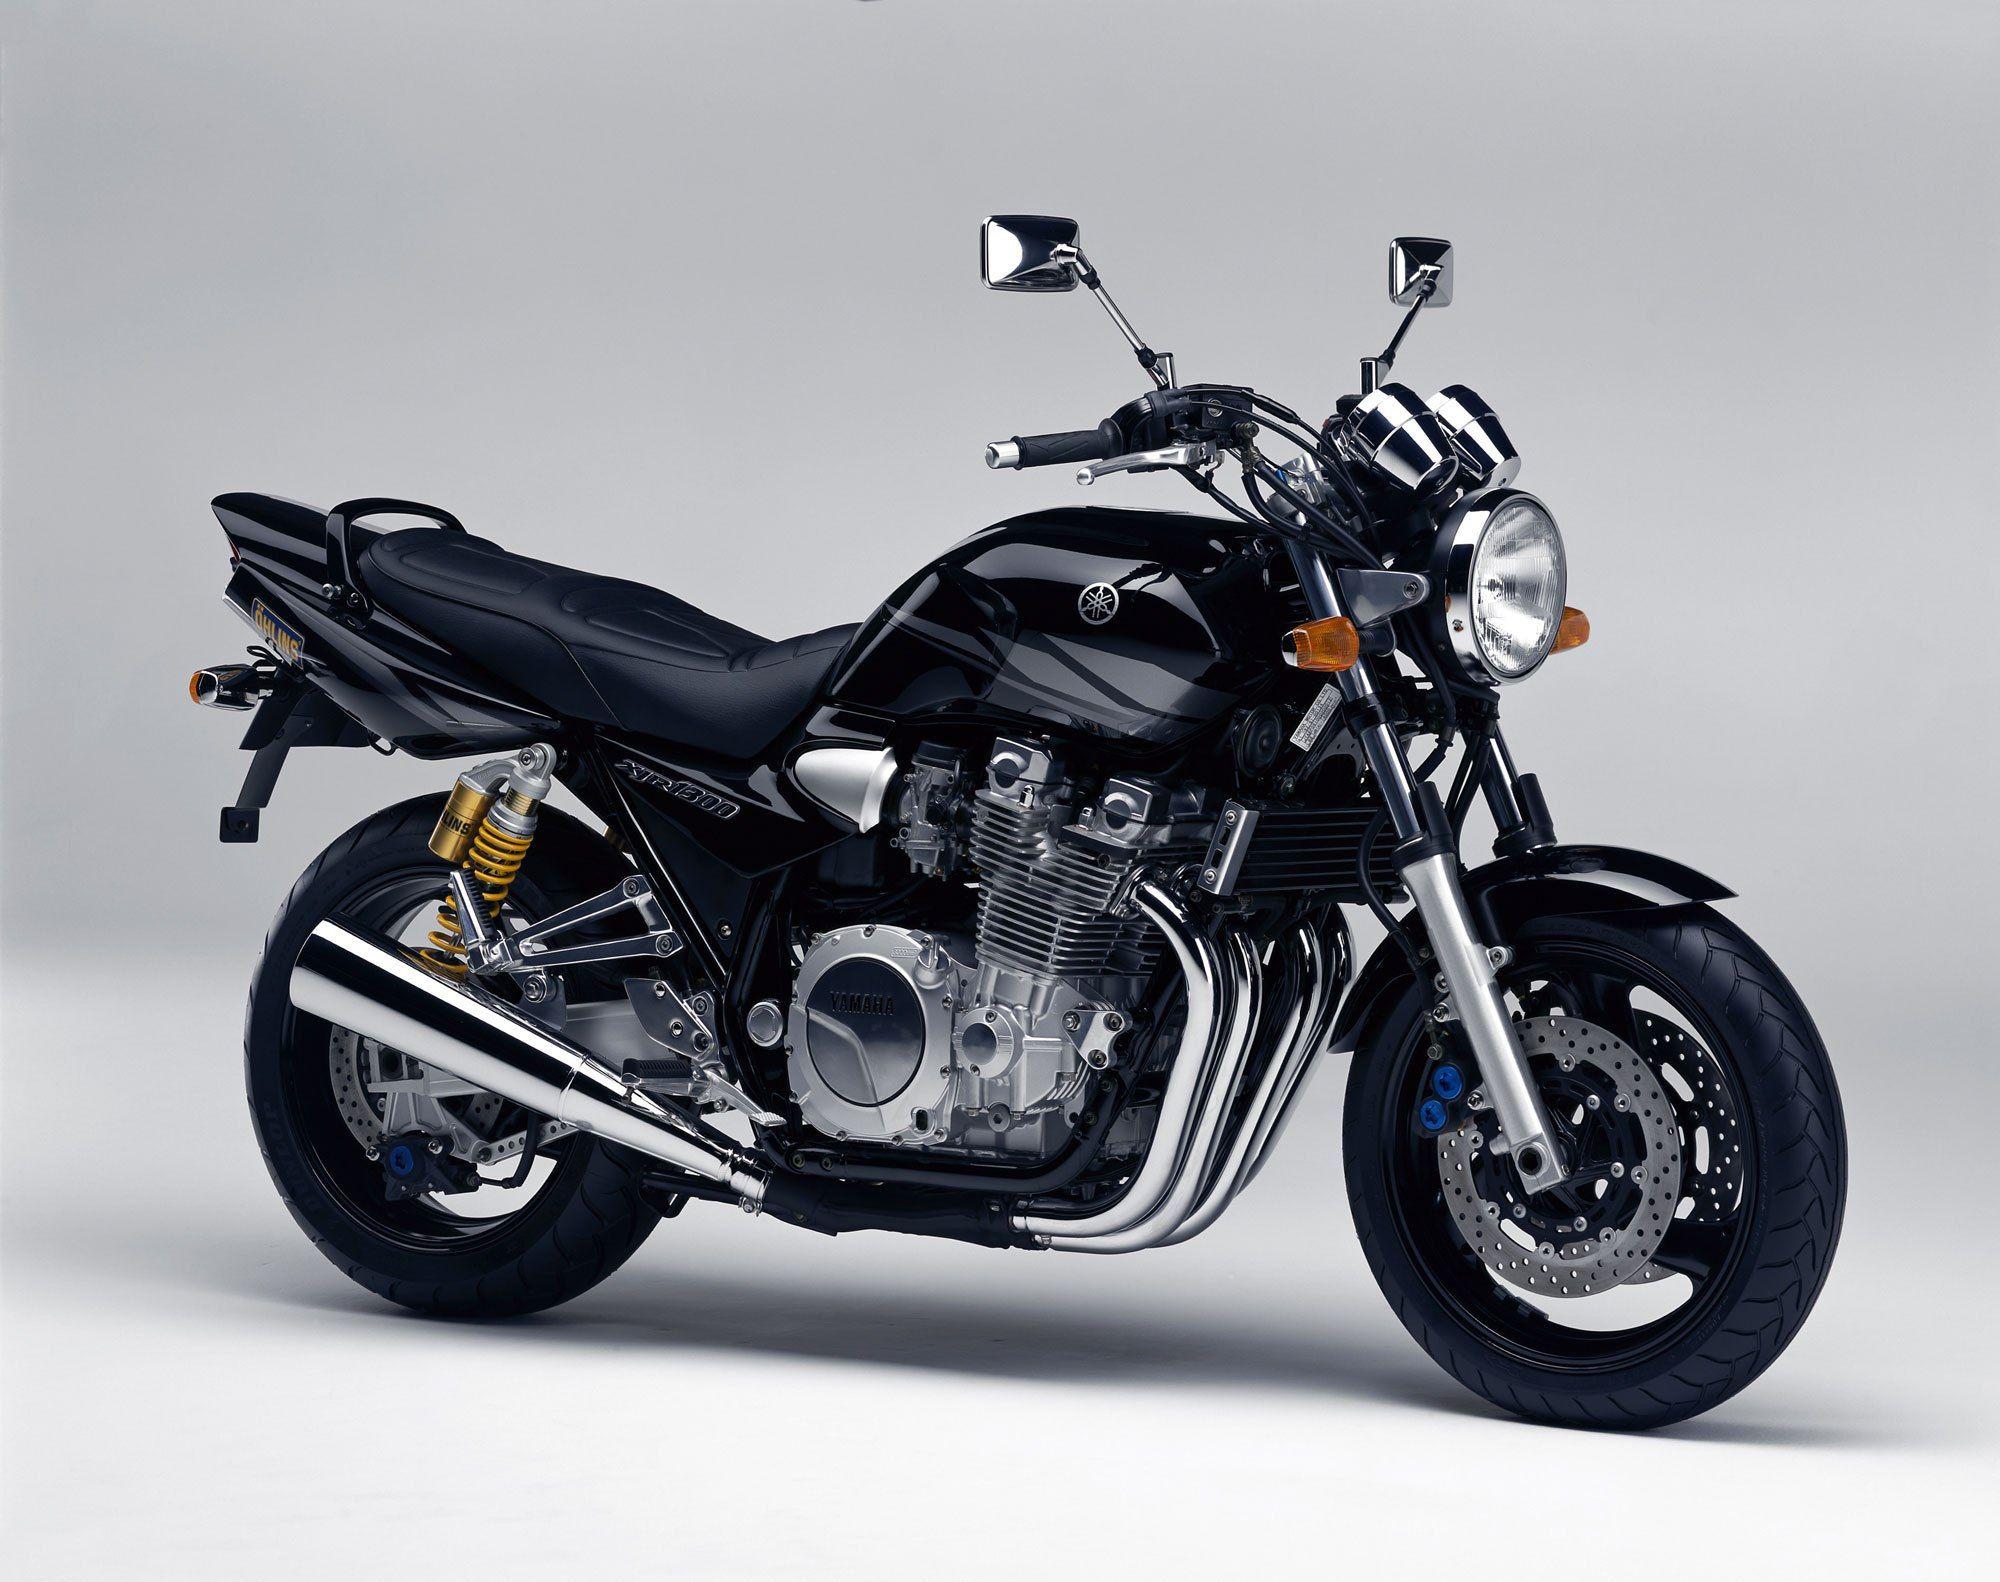 Yamaha Xjr1300 Photo 1 Yamaha Motorcycles Cruiser Yamaha Cafe Racer Yamaha